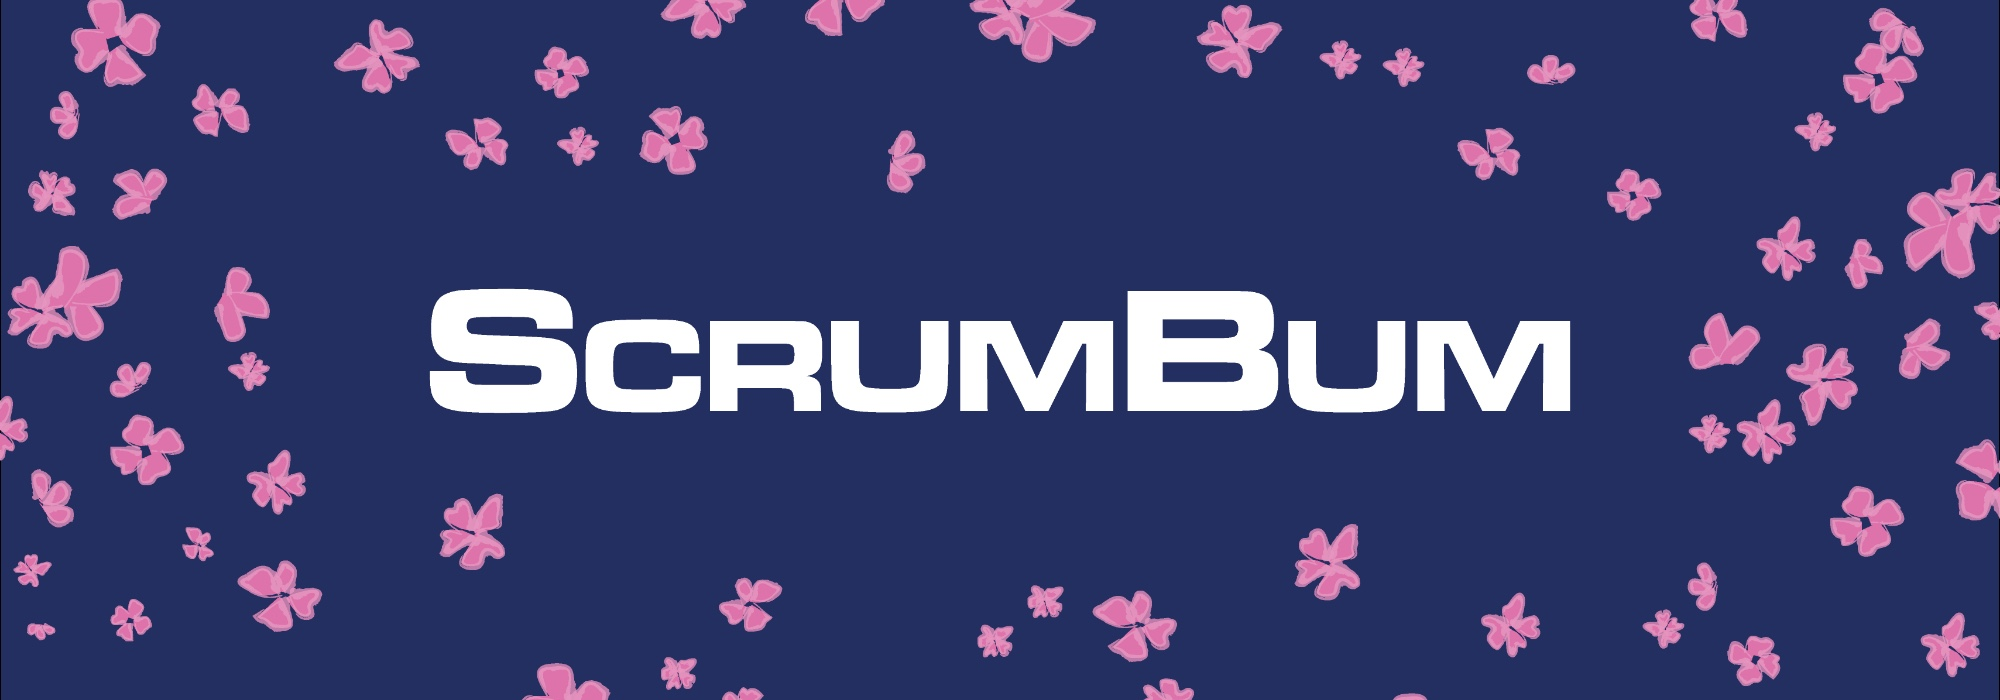 ScrumBum_Social_Banner_Images_v1.jpg